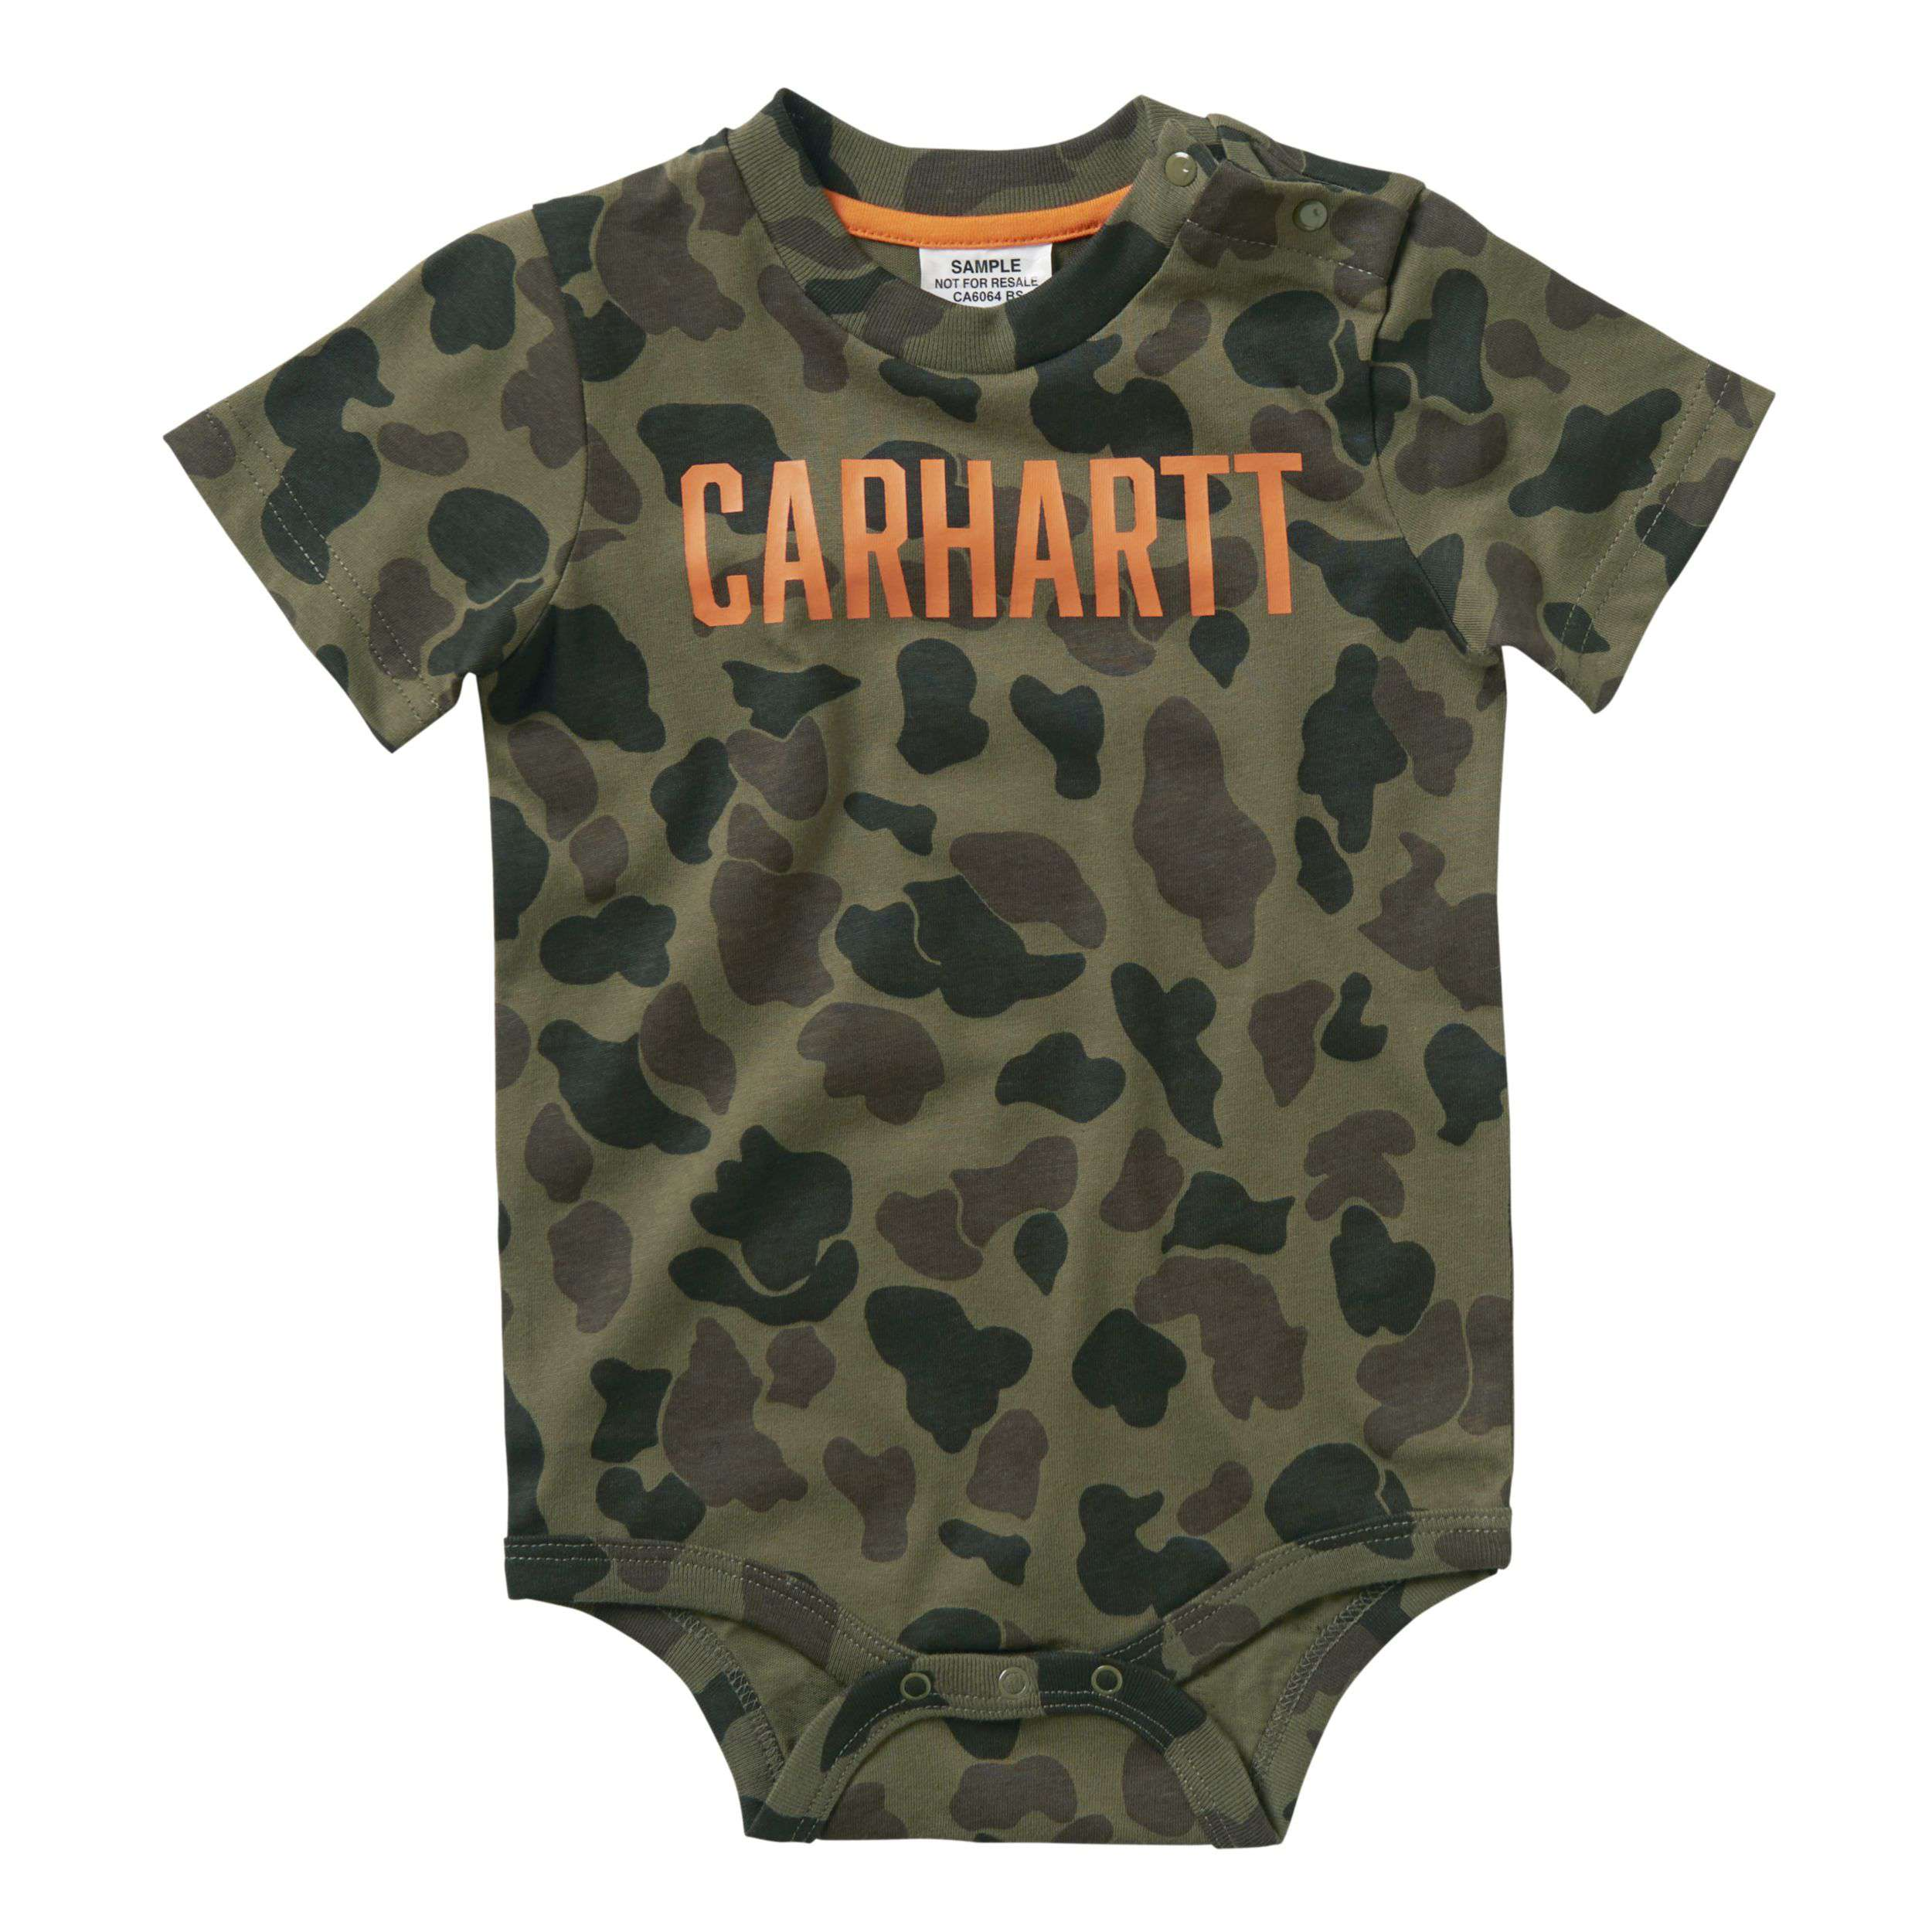 Carhartt Short-Sleeve Camo Printed Bodyshirt